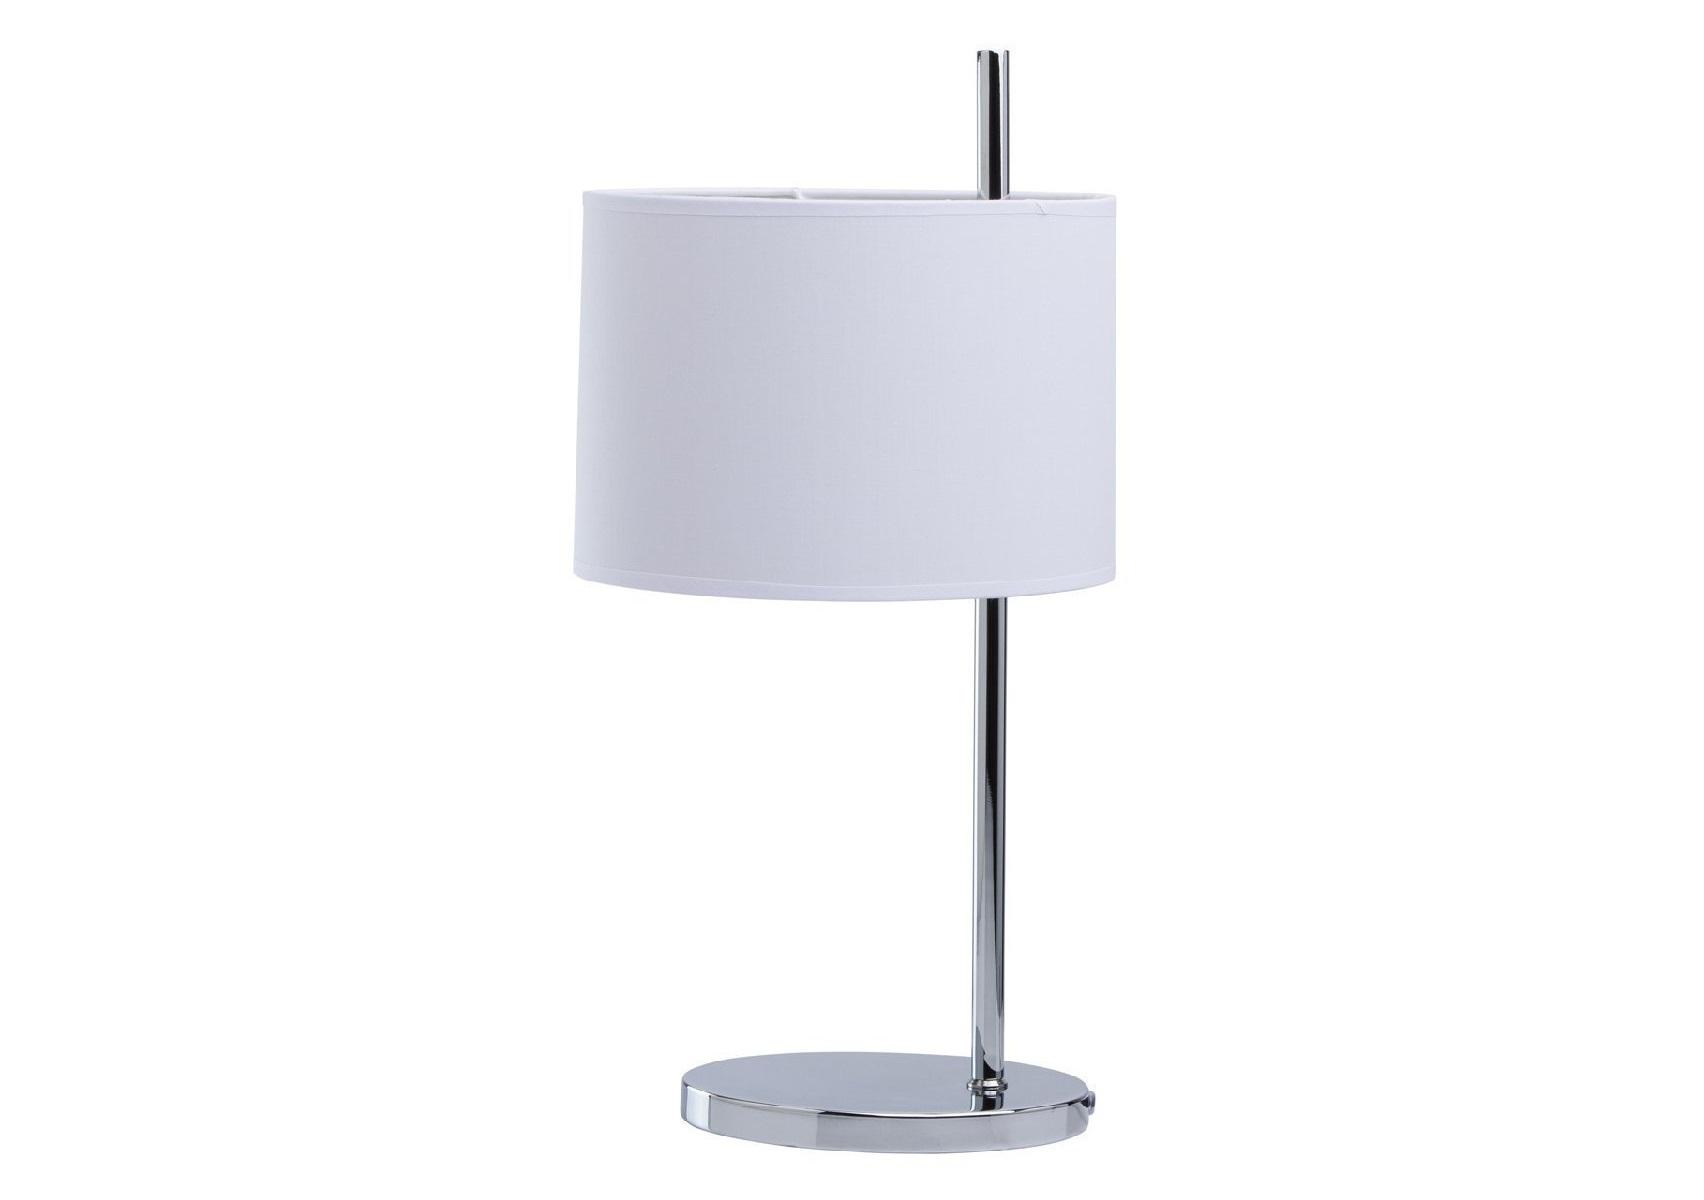 Настольная лампаДекоративные лампы<br>&amp;lt;div&amp;gt;Вид цоколя: E27&amp;lt;/div&amp;gt;&amp;lt;div&amp;gt;Мощность: 40W&amp;amp;nbsp;&amp;lt;/div&amp;gt;&amp;lt;div&amp;gt;Количество ламп: 1&amp;lt;/div&amp;gt;<br><br>Material: Металл<br>Width см: 22<br>Depth см: 26<br>Height см: 56